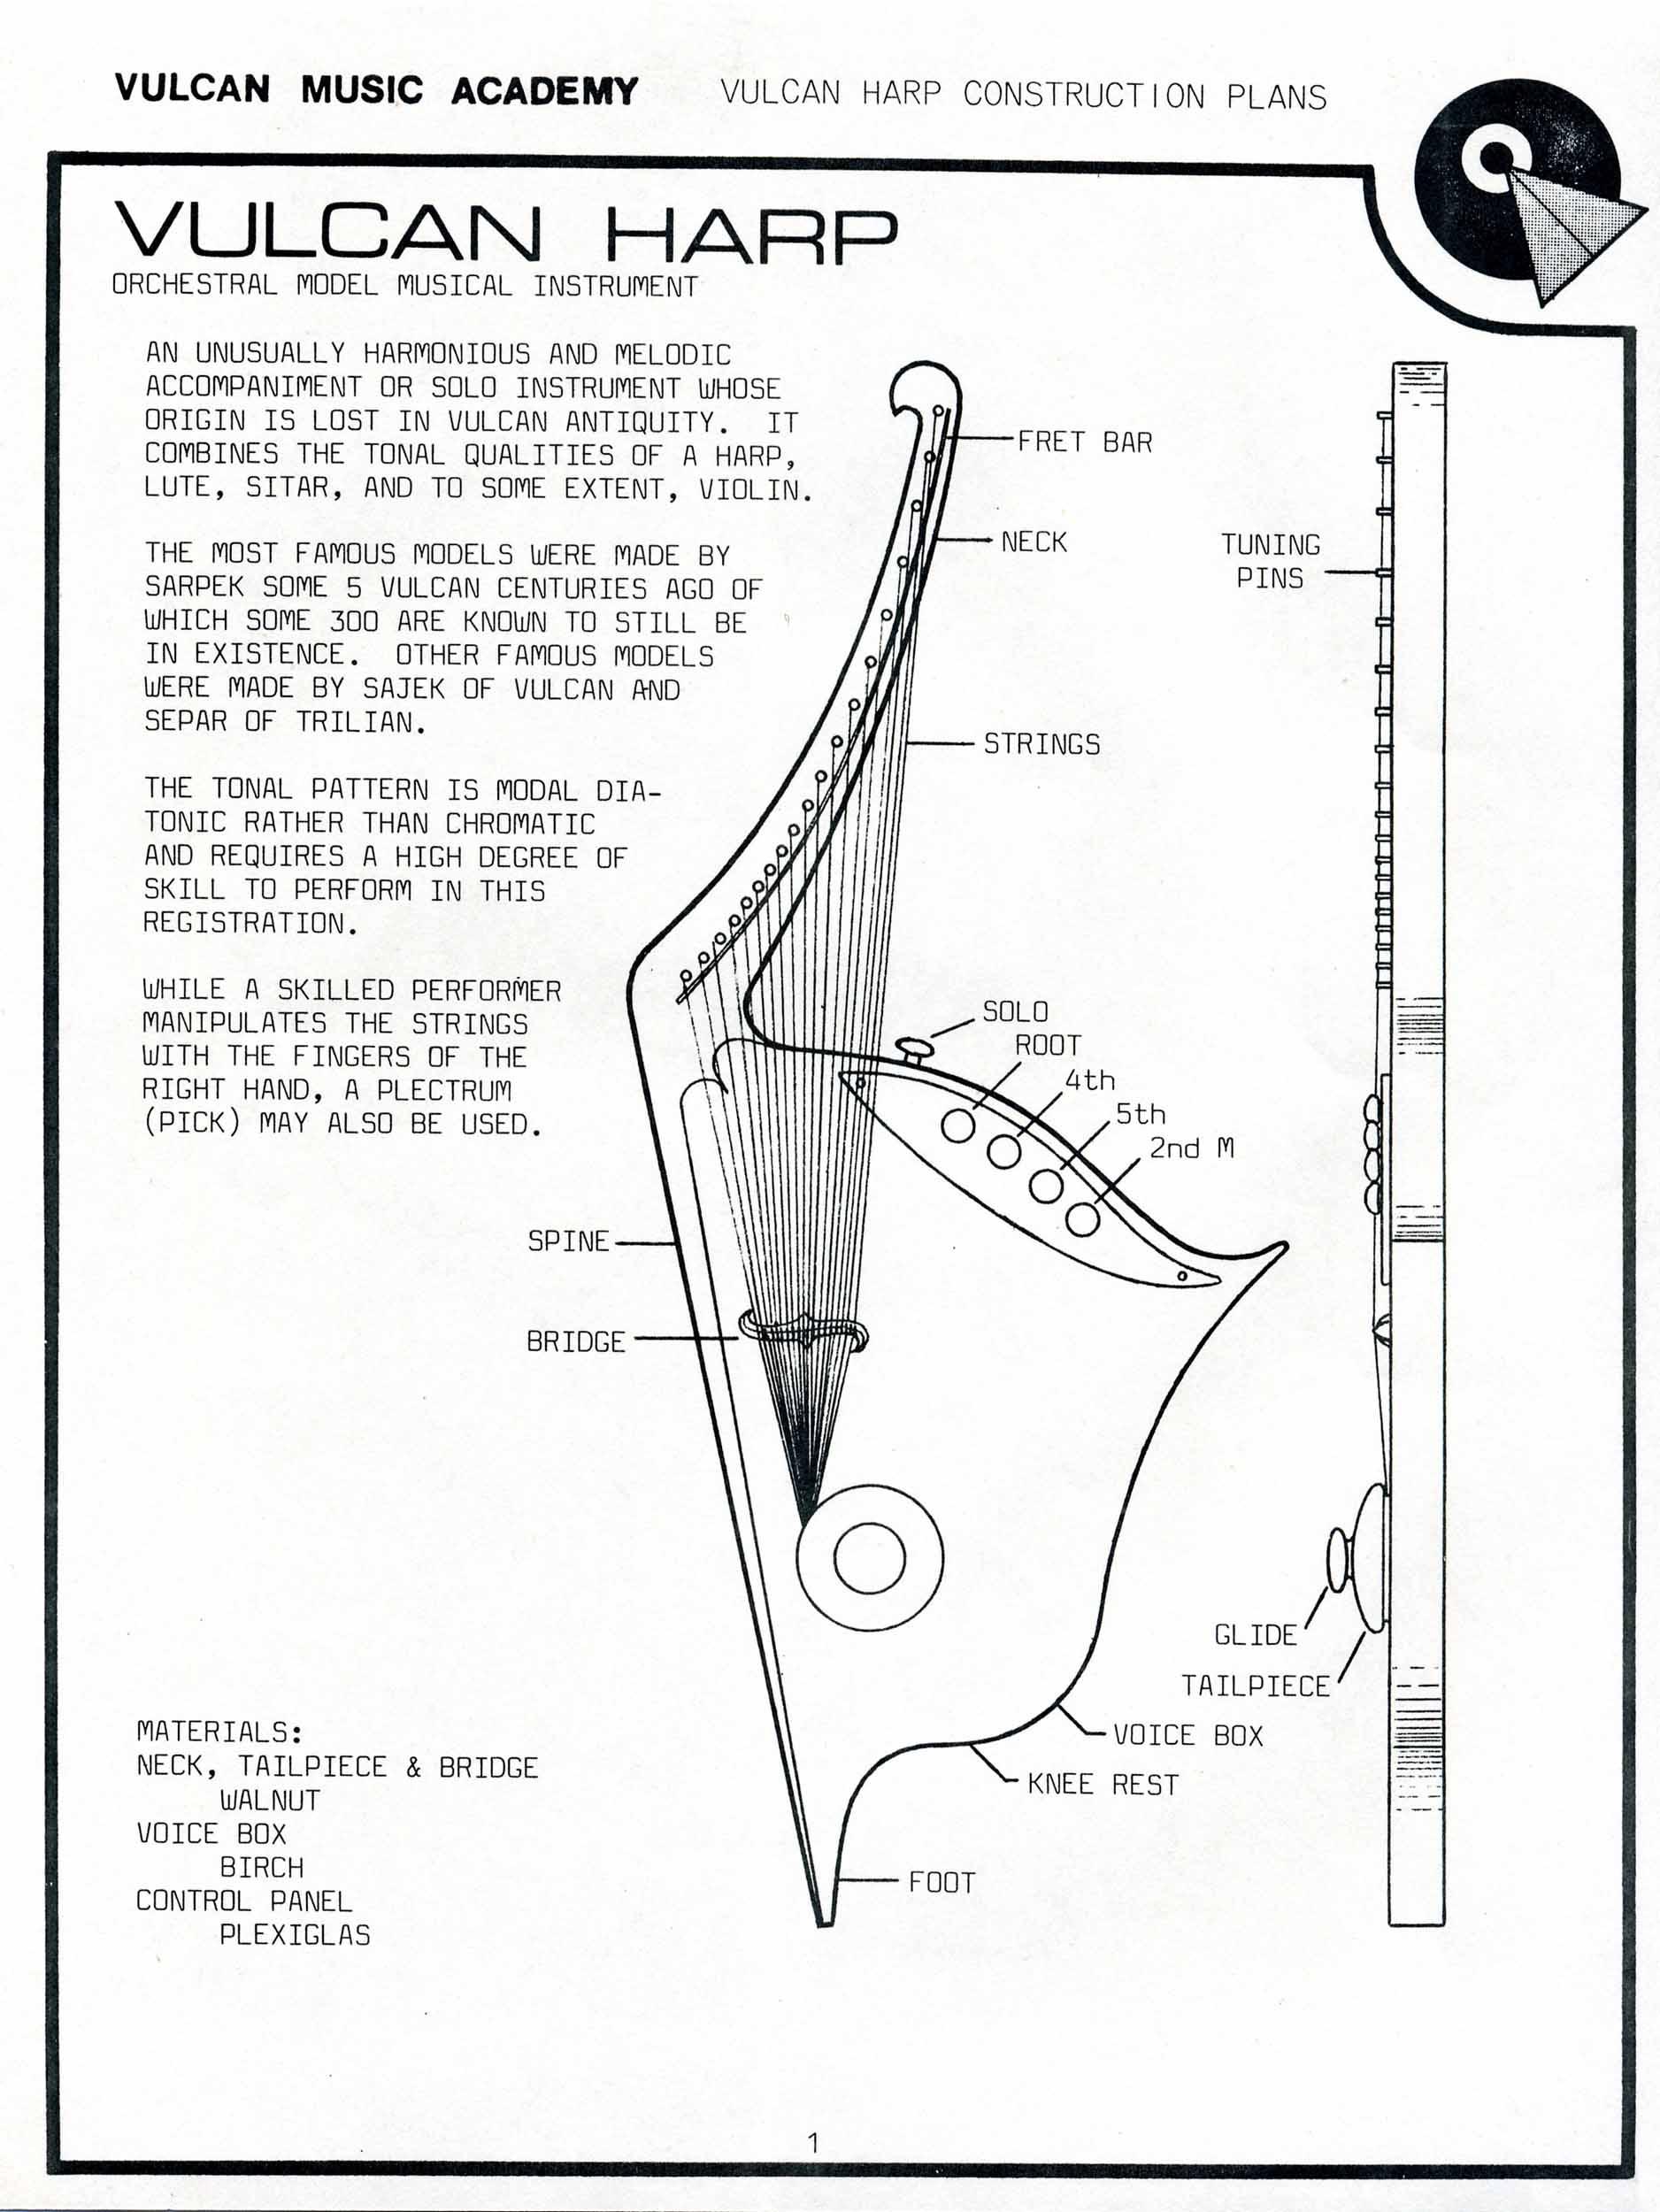 hight resolution of vulcan harp construction plans